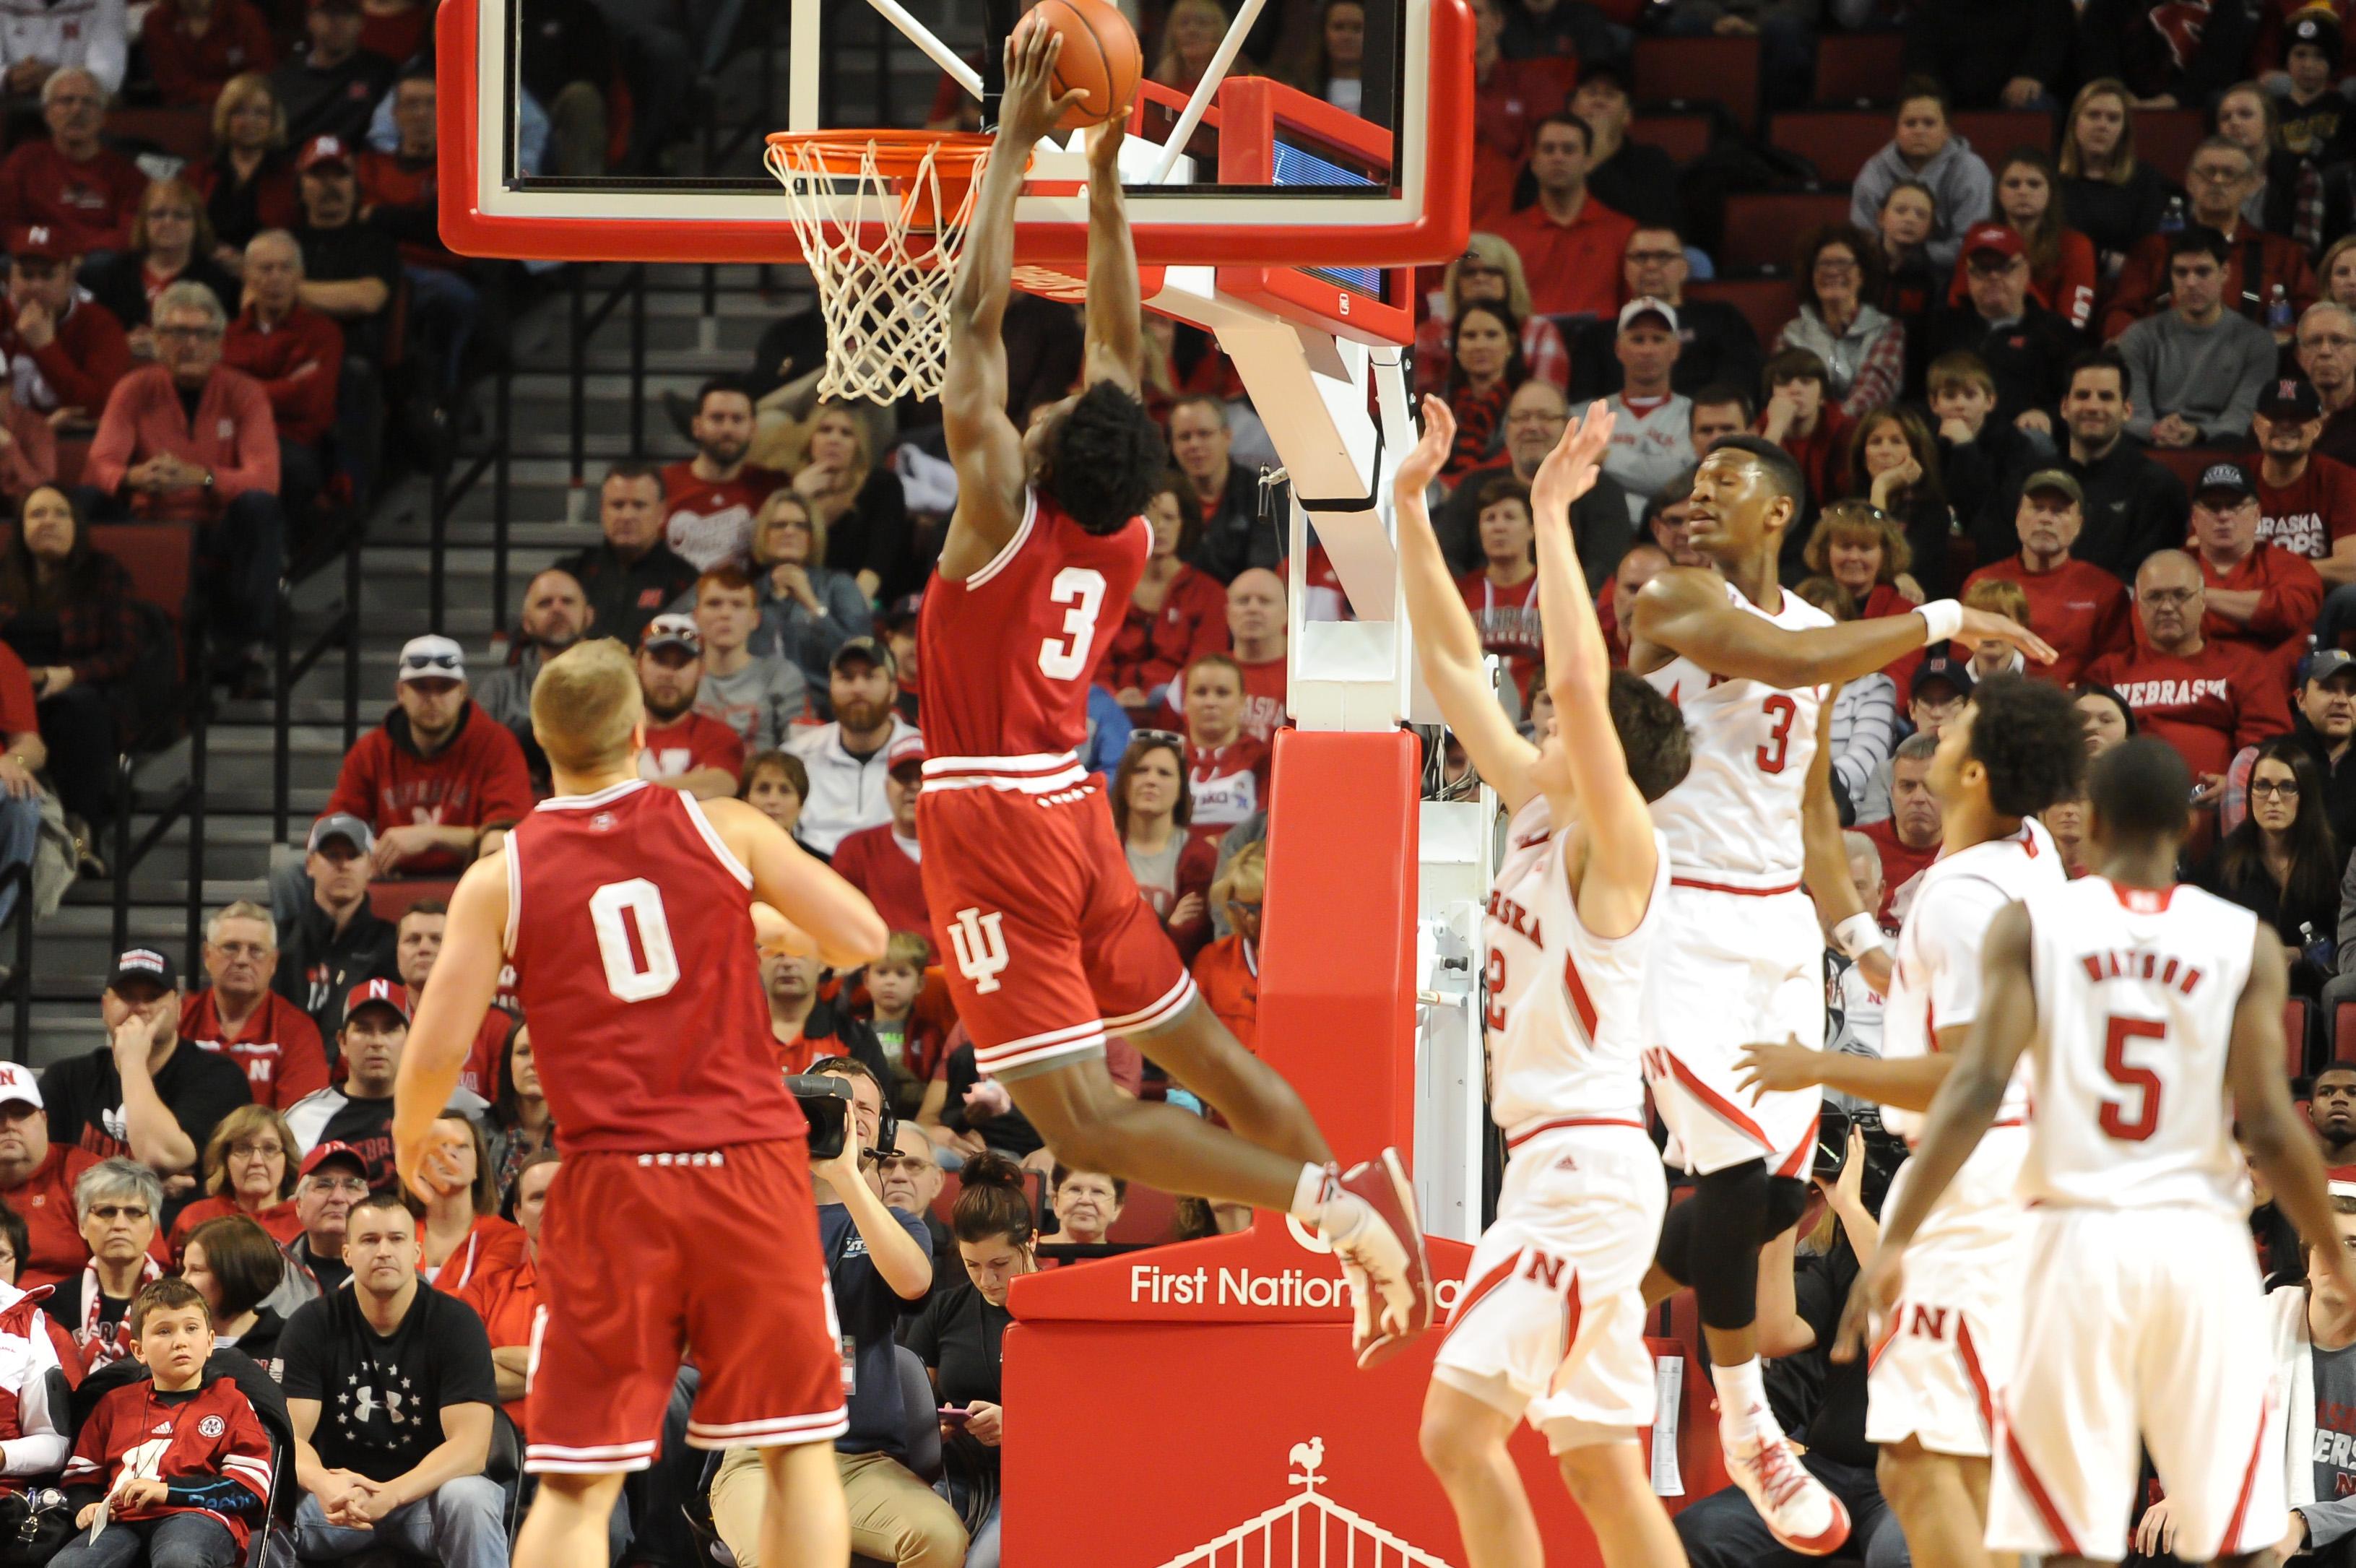 9031746-ncaa-basketball-indiana-at-nebraska